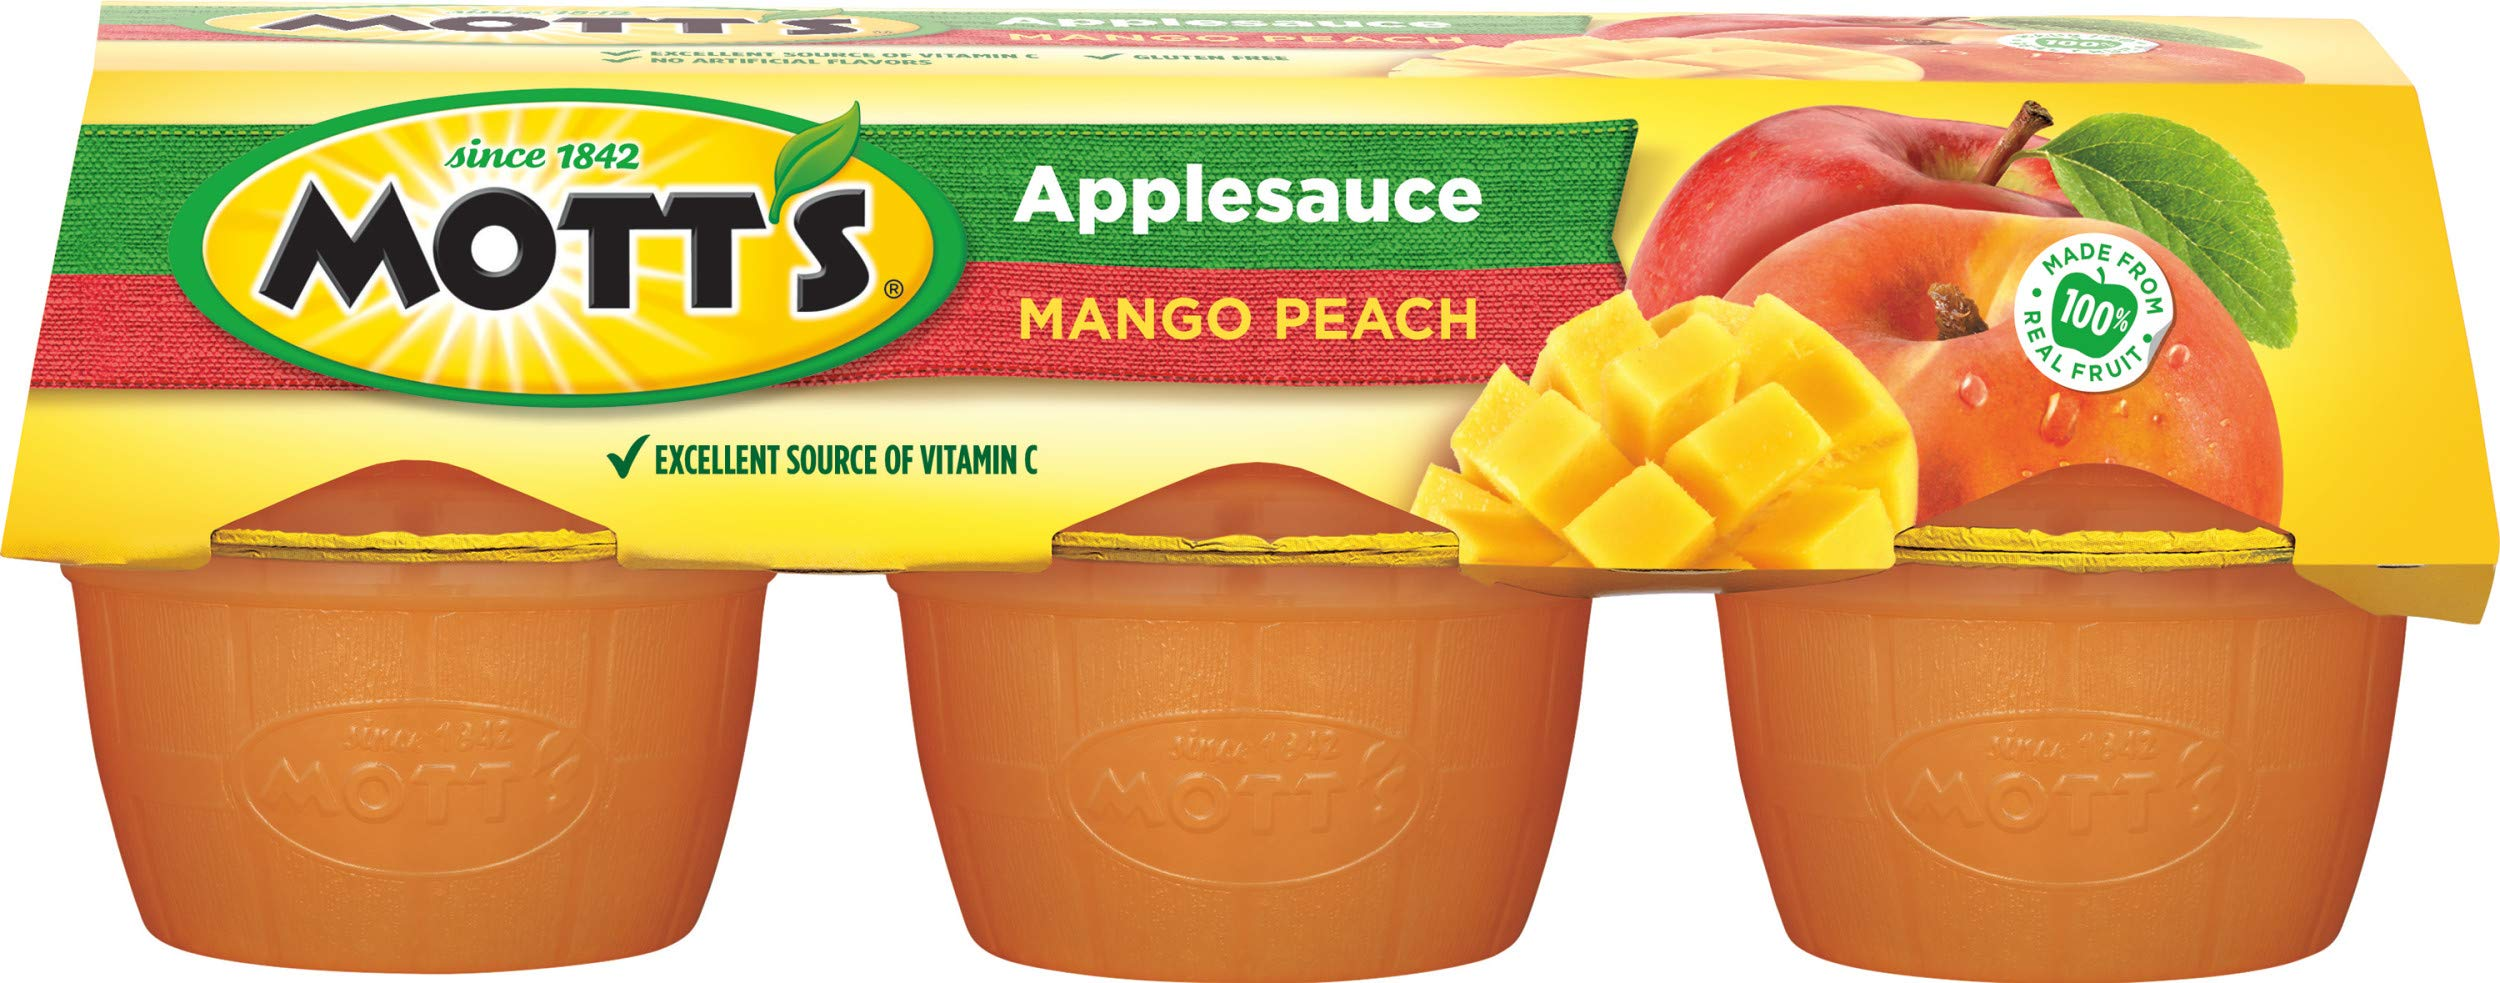 Motts Fruitsations Mango Peach Apple Sauce, 24 oz